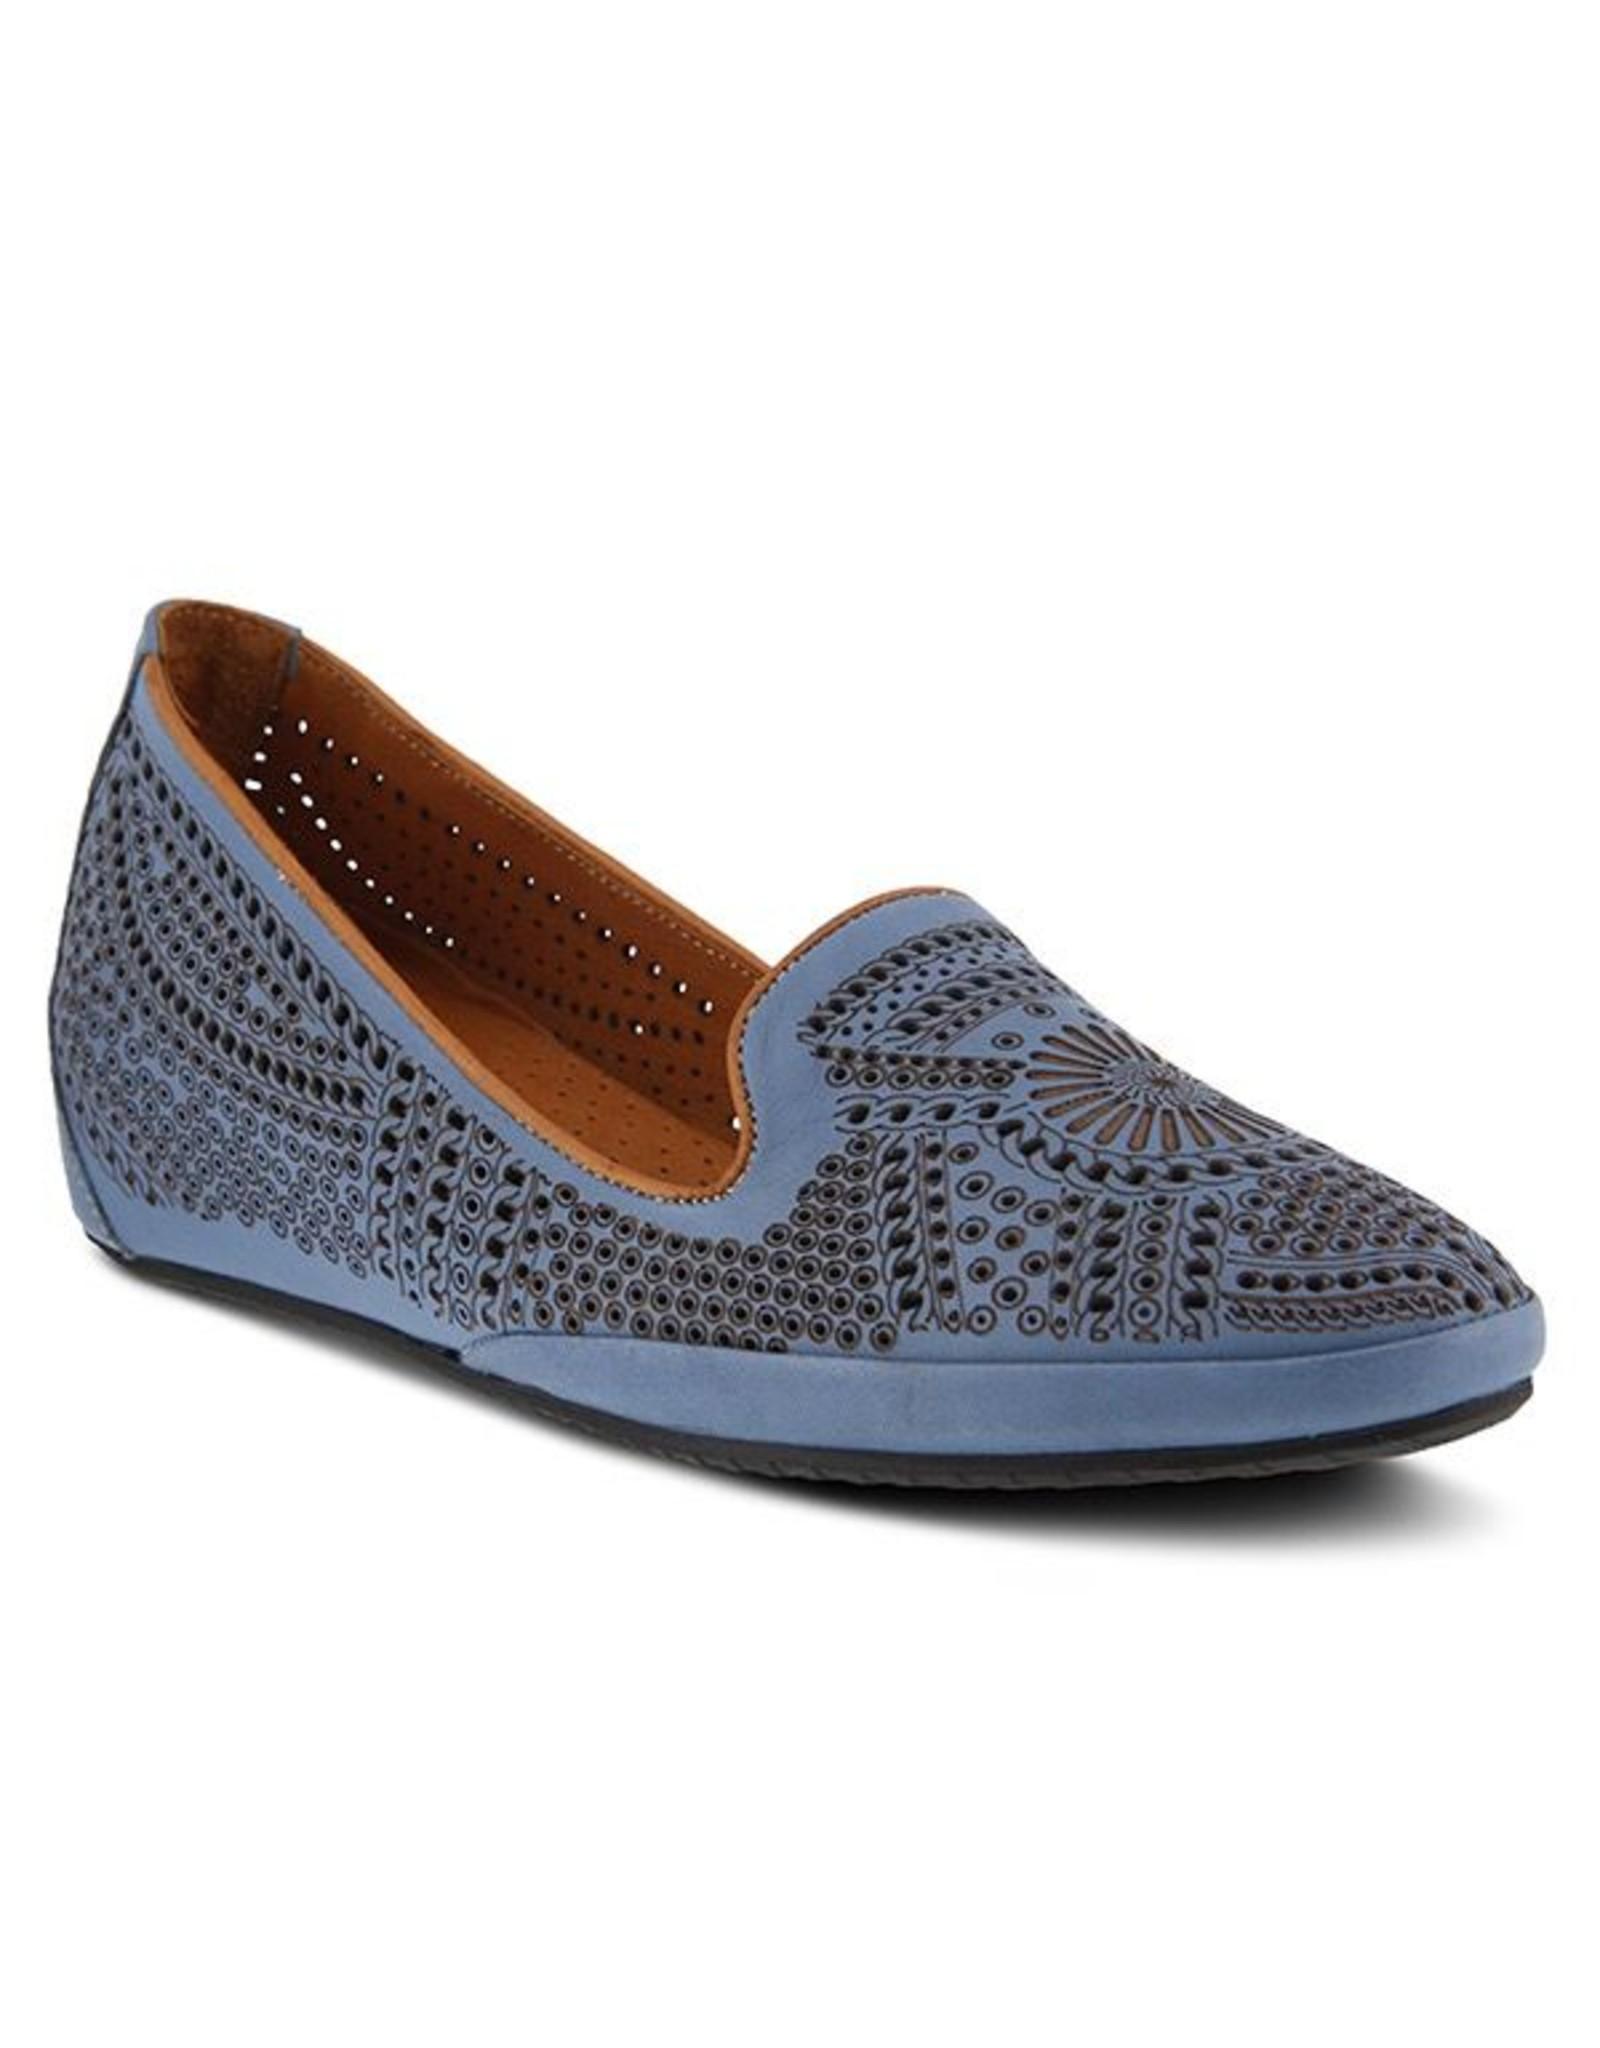 Shondra Leather Shoe